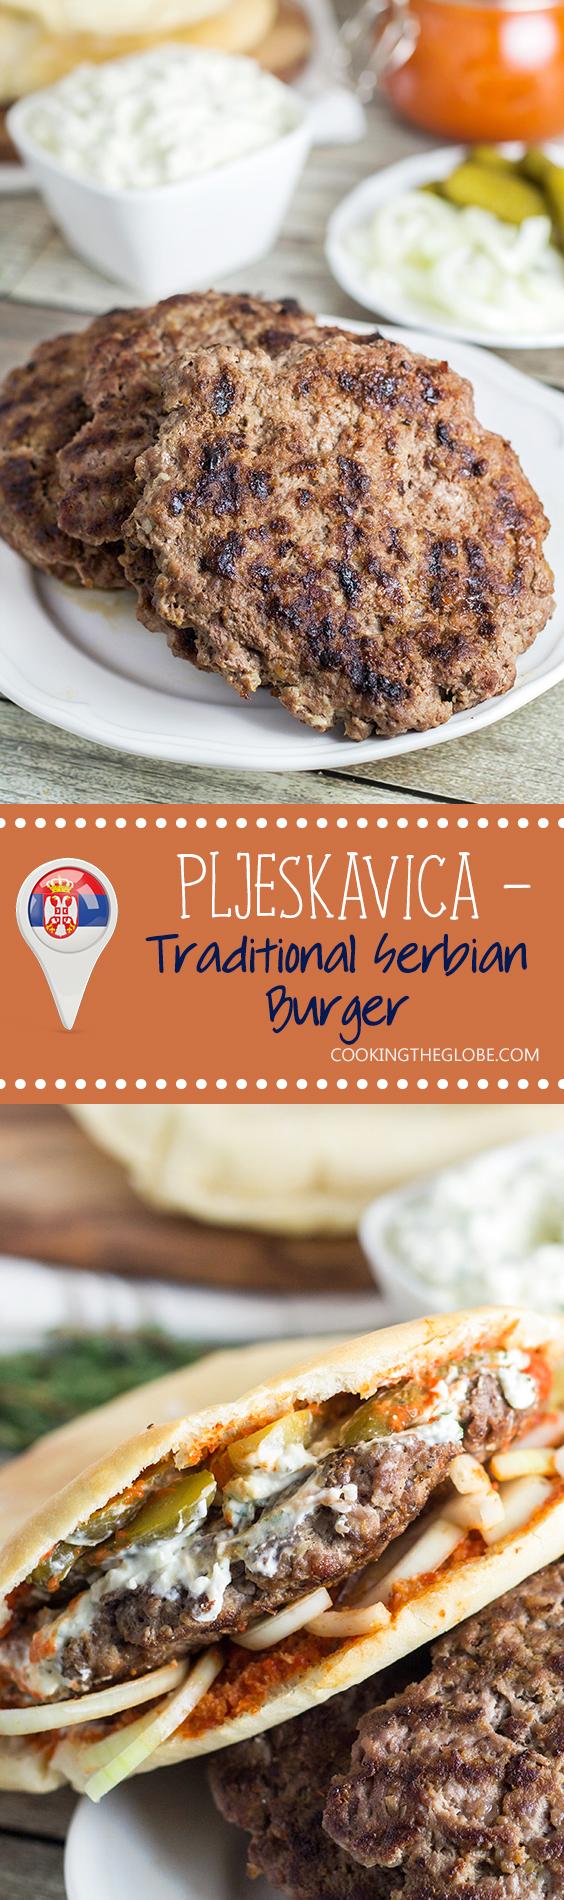 Pljeskavica - Traditional Serbian Burger Recipe #mazedonischesessen